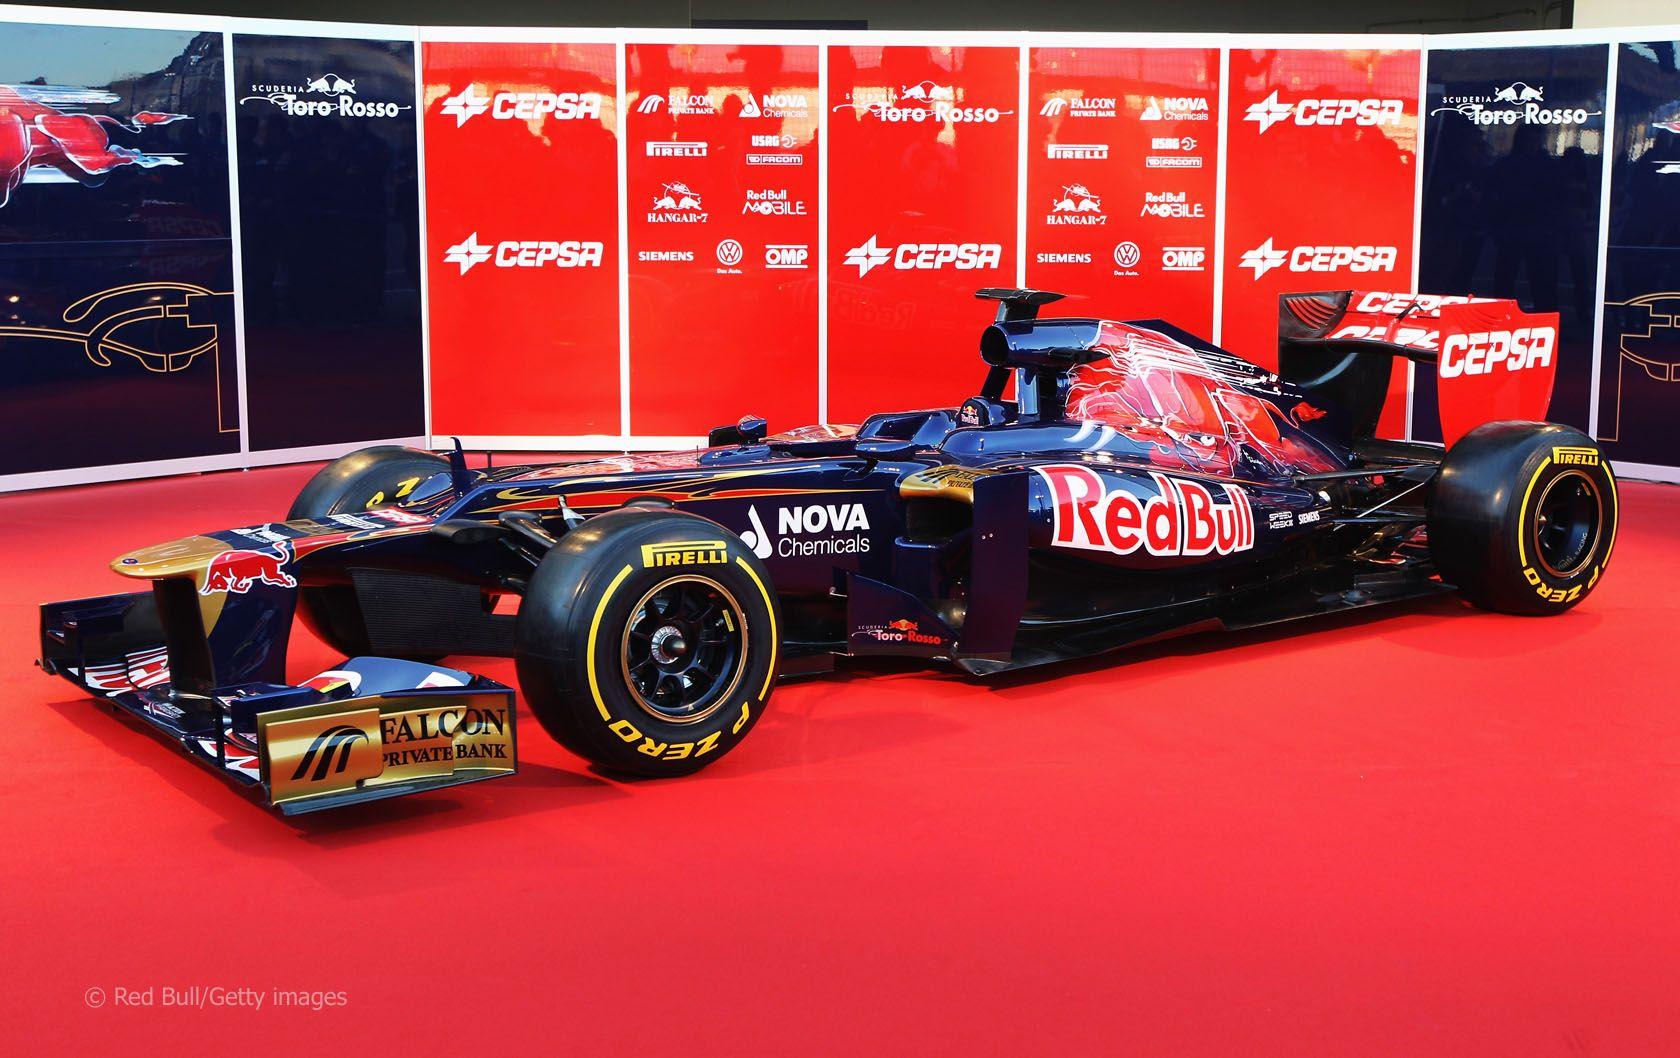 Toro Rosso STR7, 2012 Vw fusca, Nova, Fusca